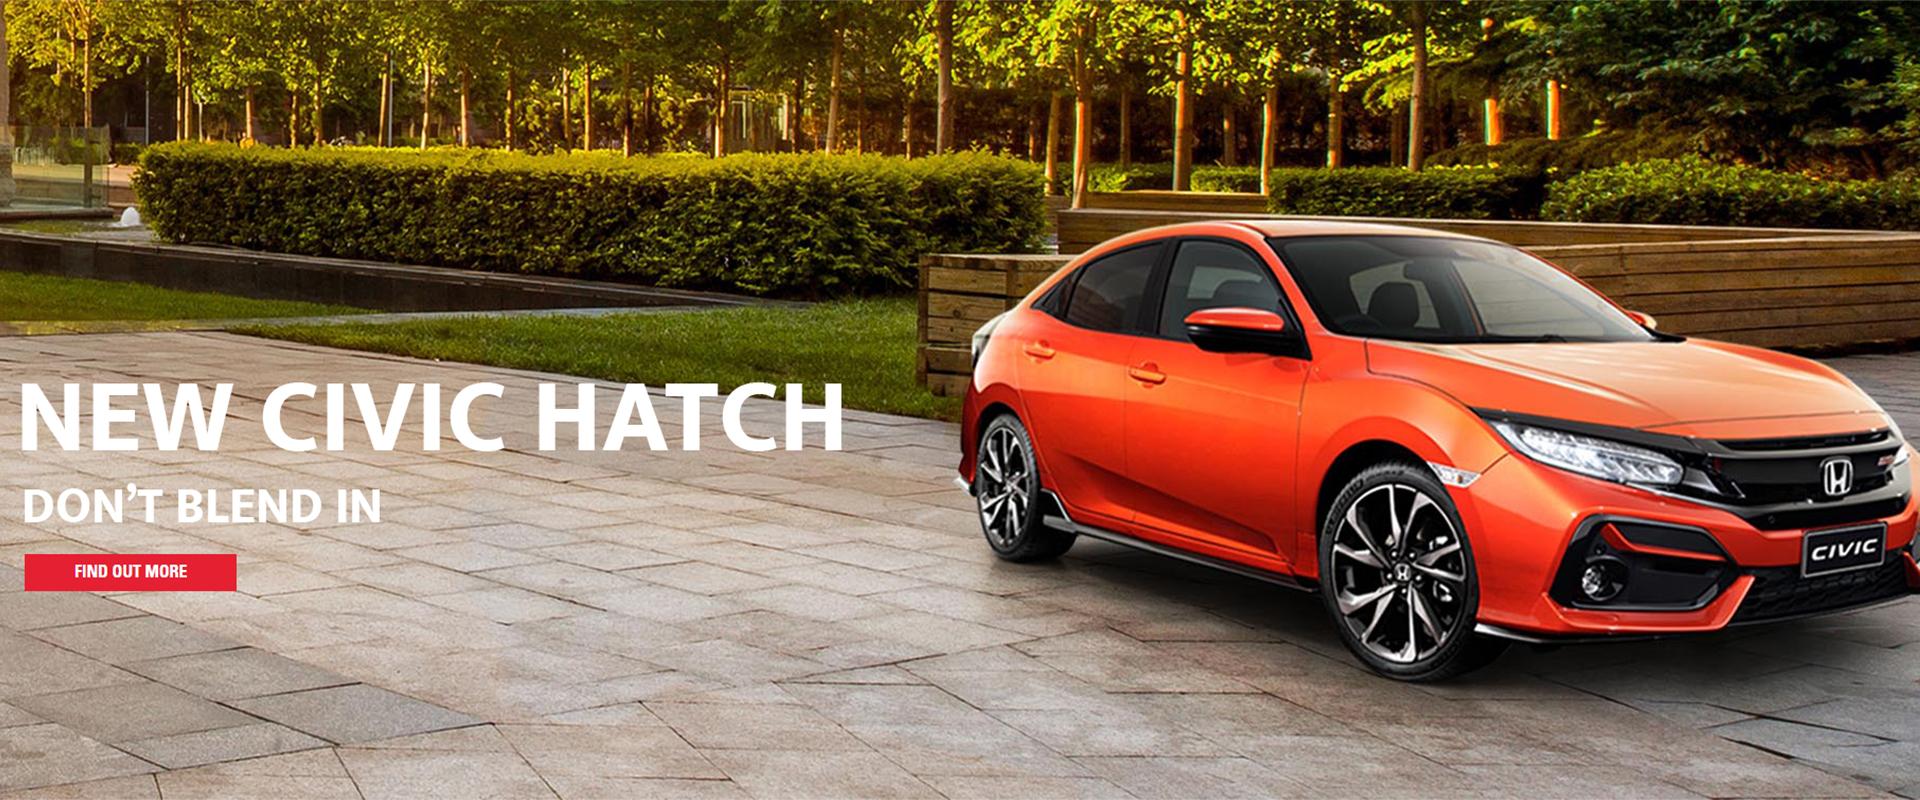 New Civic Hatch